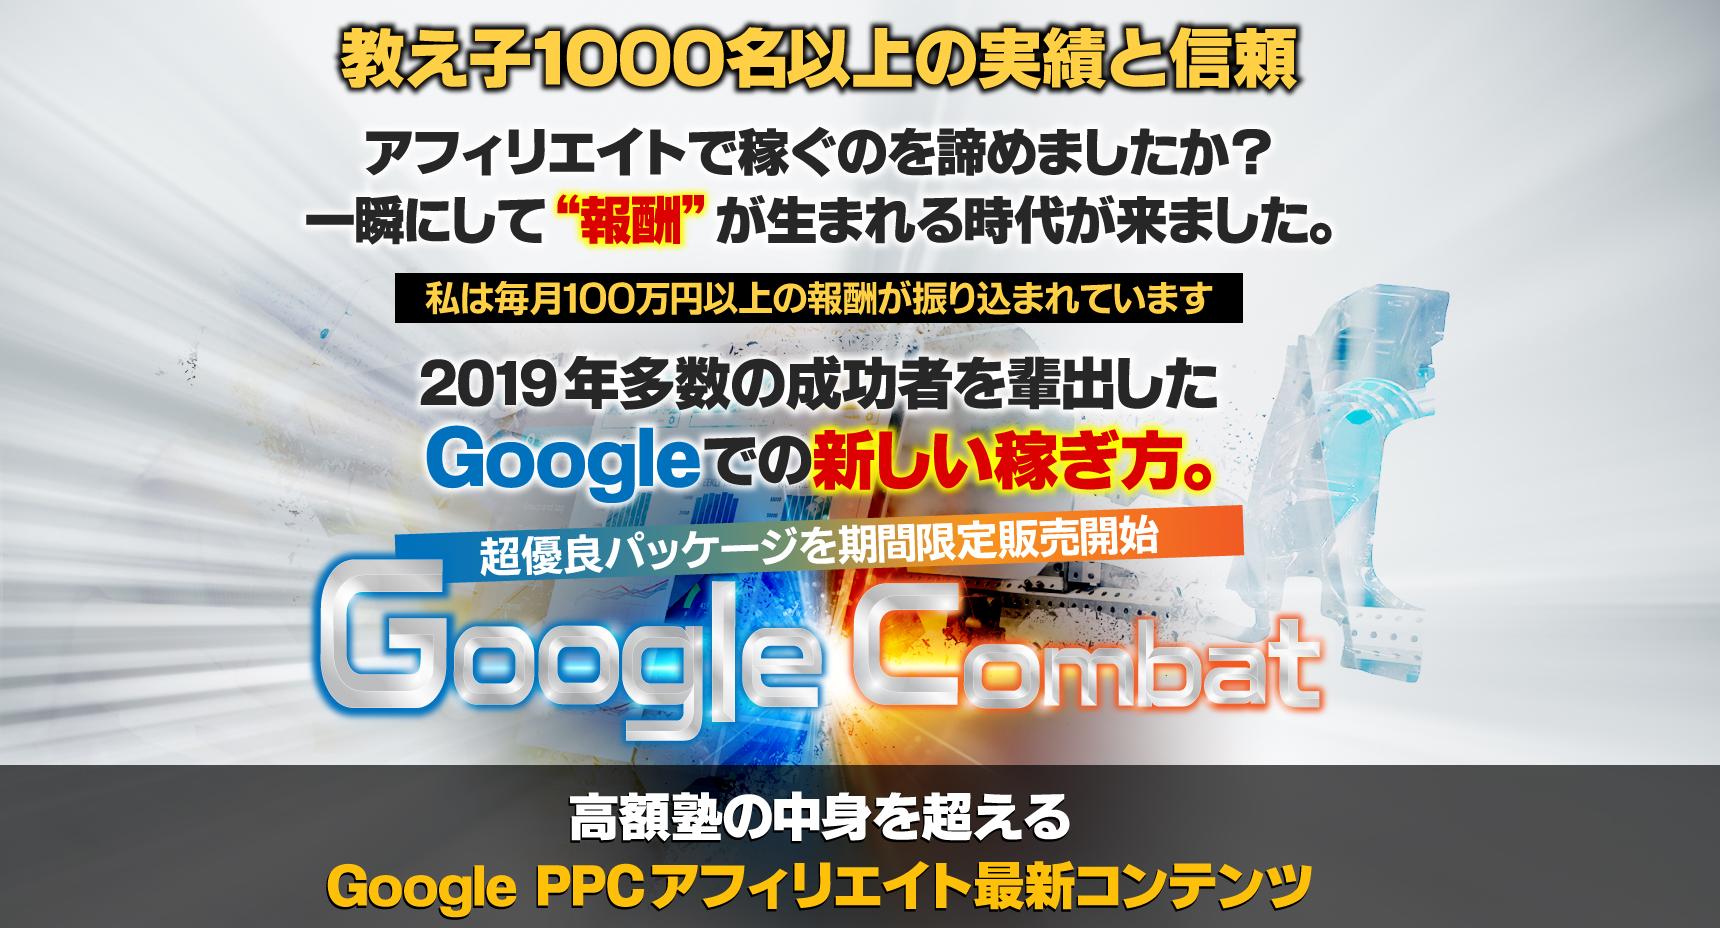 Google Combat(グーグルコンバット)PPC教材の最強特典